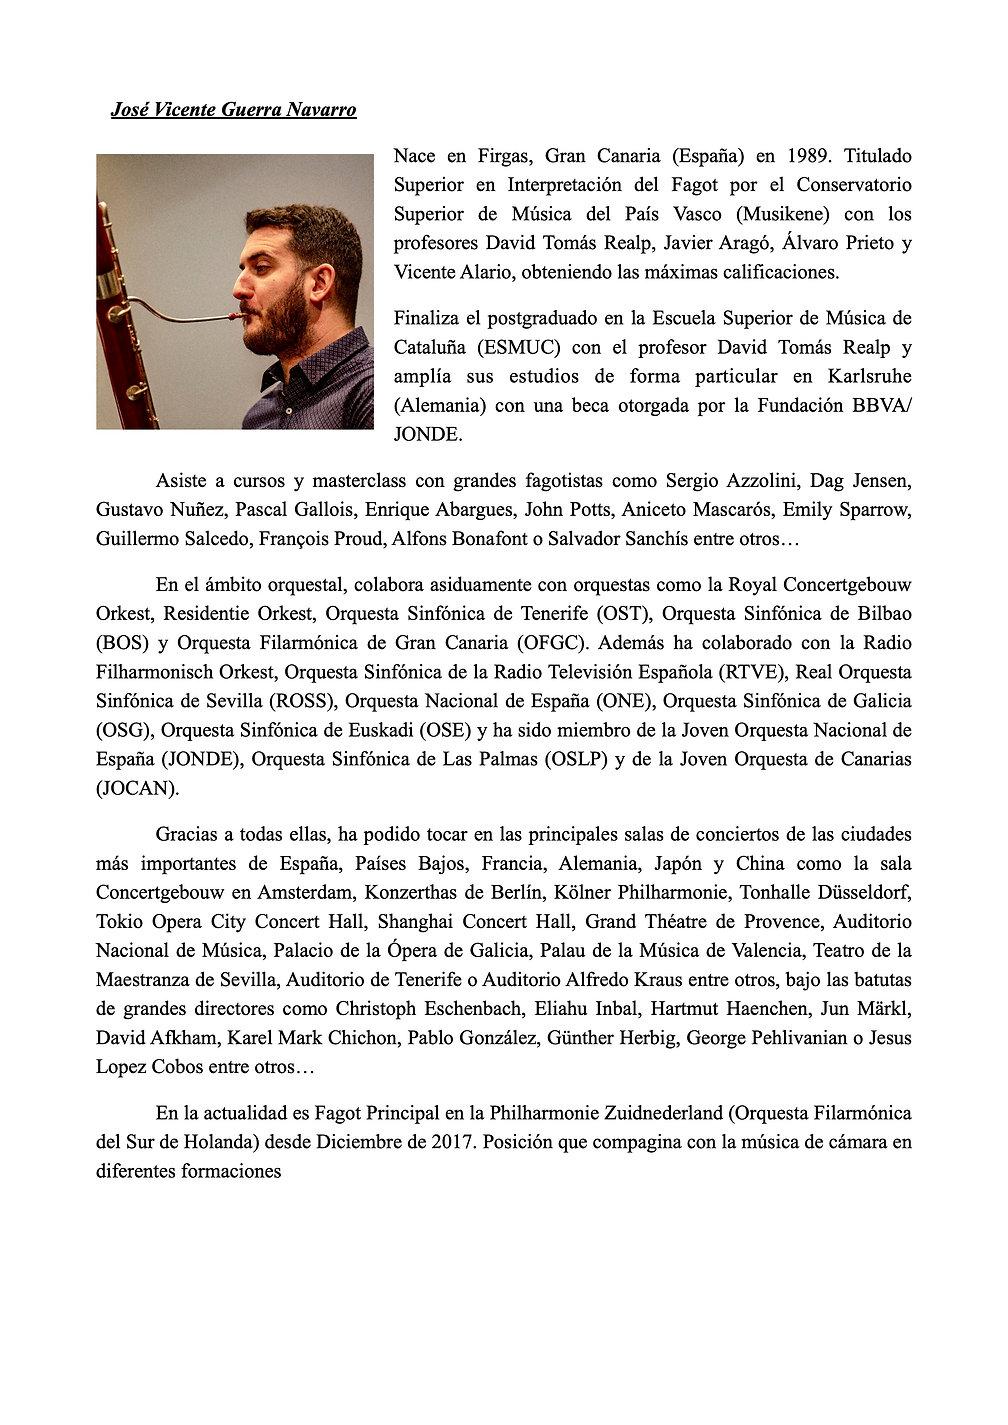 Curriculum_Bio_Joseì_V._EspanÞol.jpg